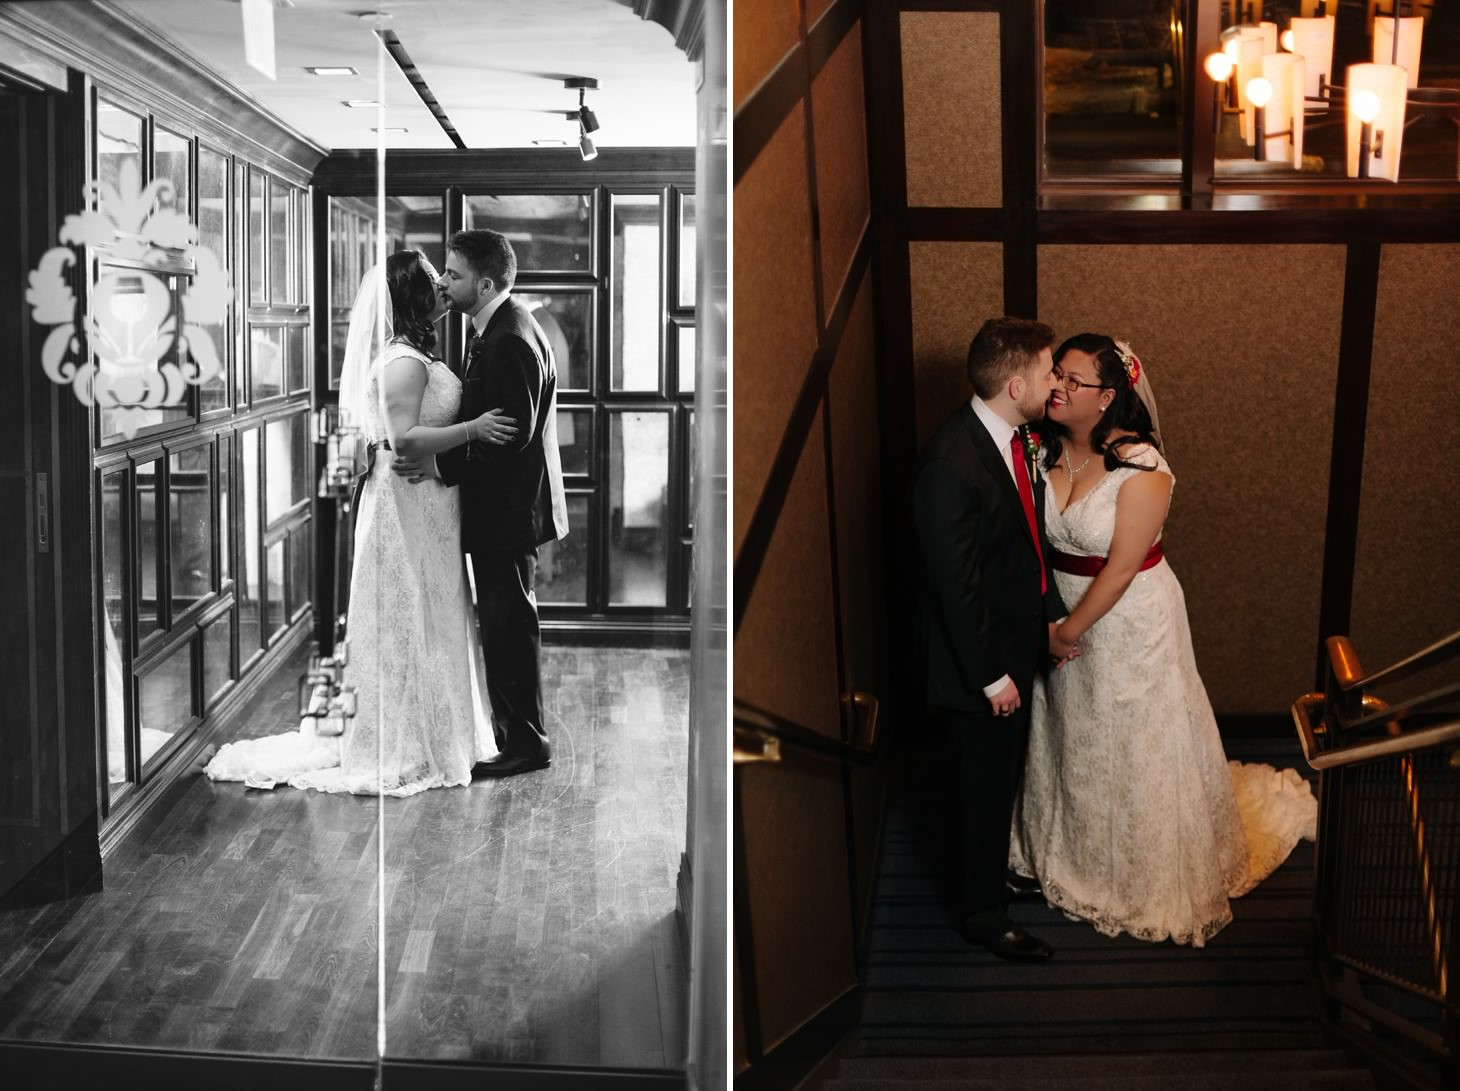 021-nyc-wedding-portrait-photographer-times-square-muse-hotel-winter-wedding-smitten-chickens.jpg